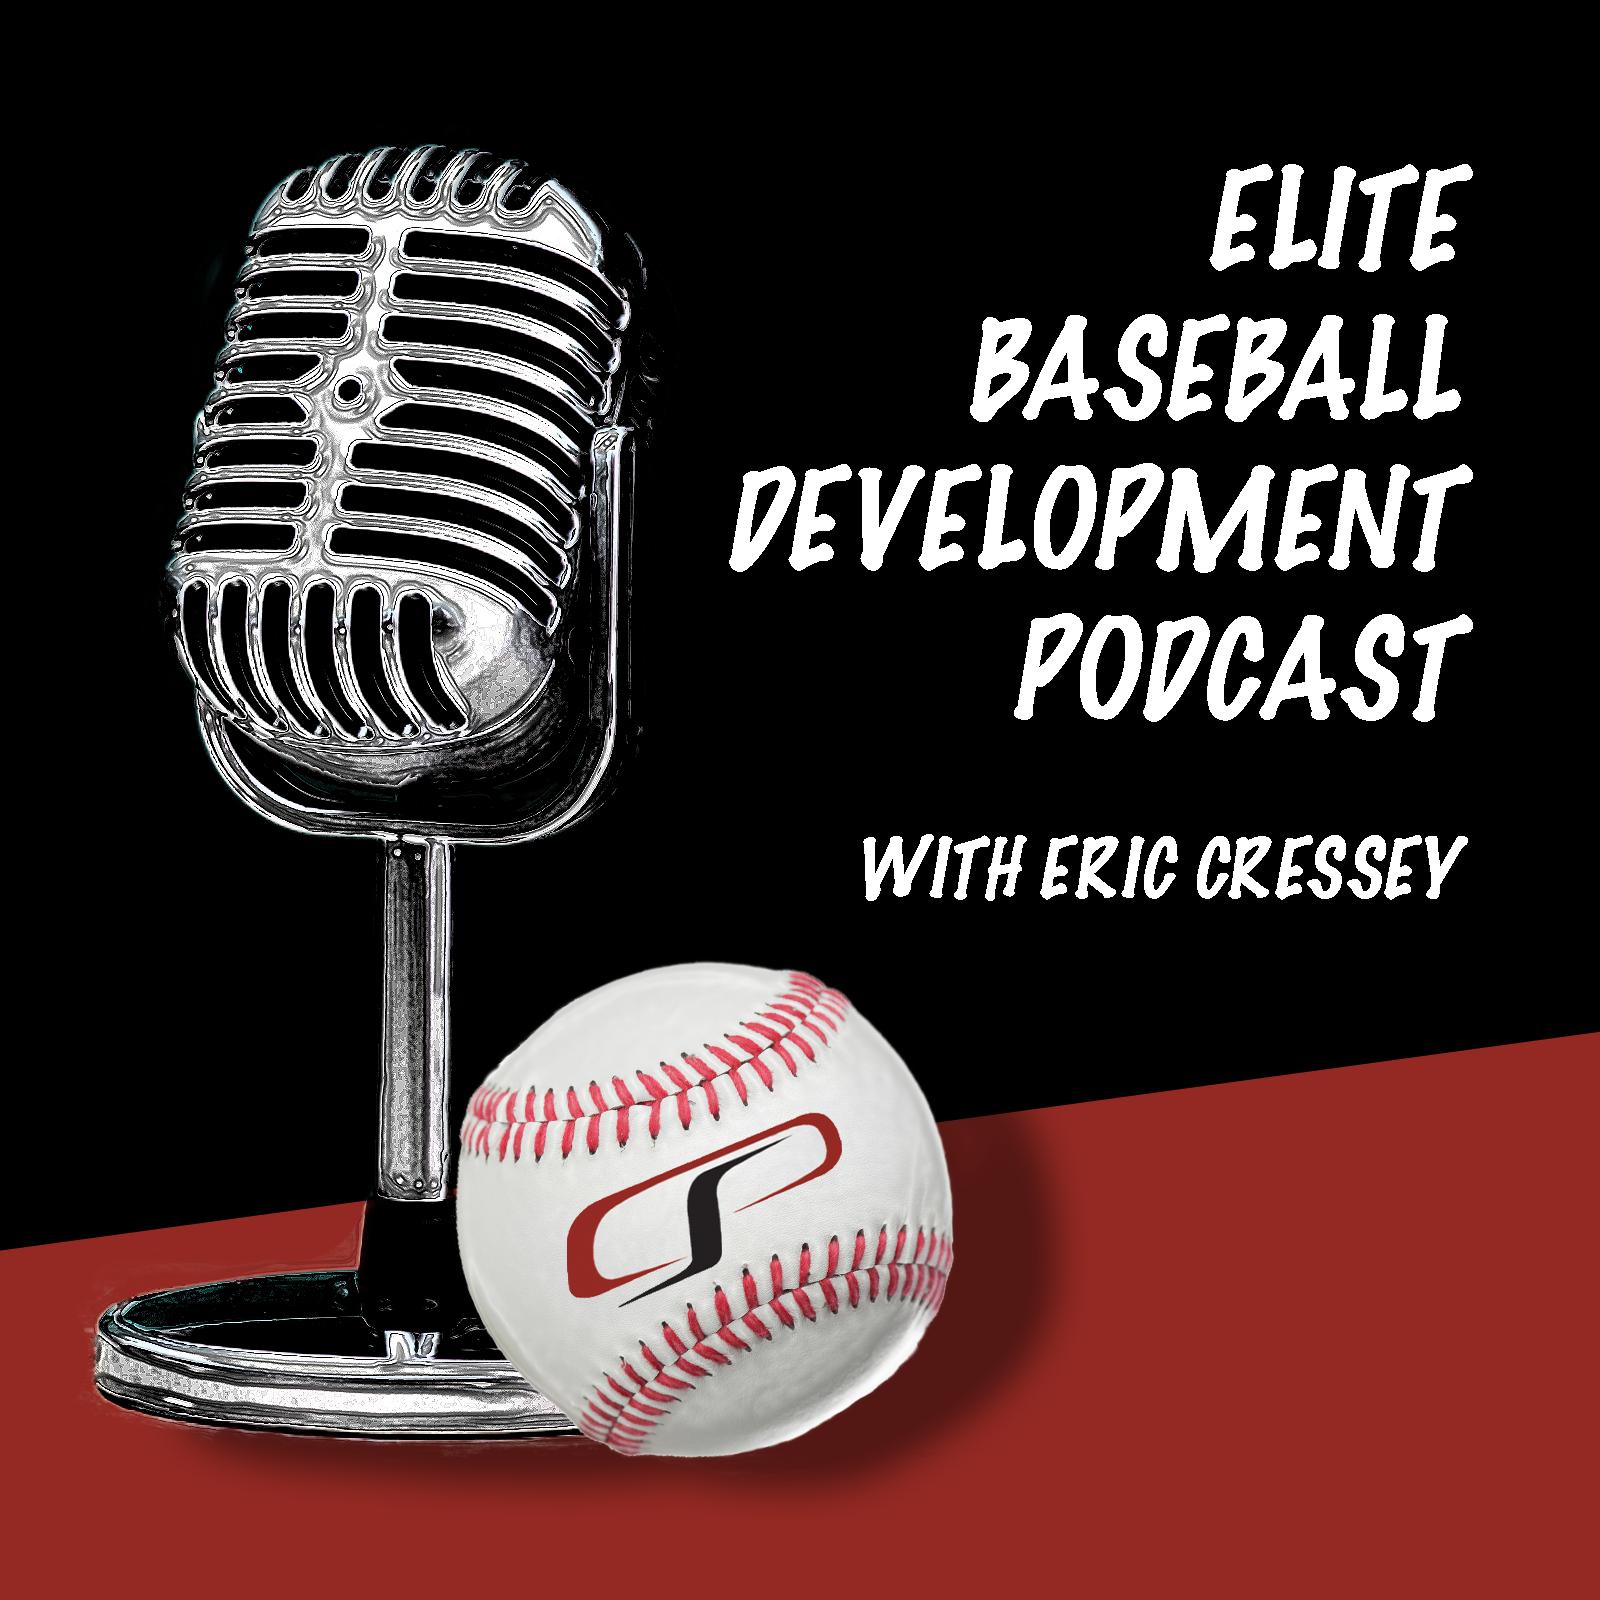 Elite Baseball Development Podcast show art